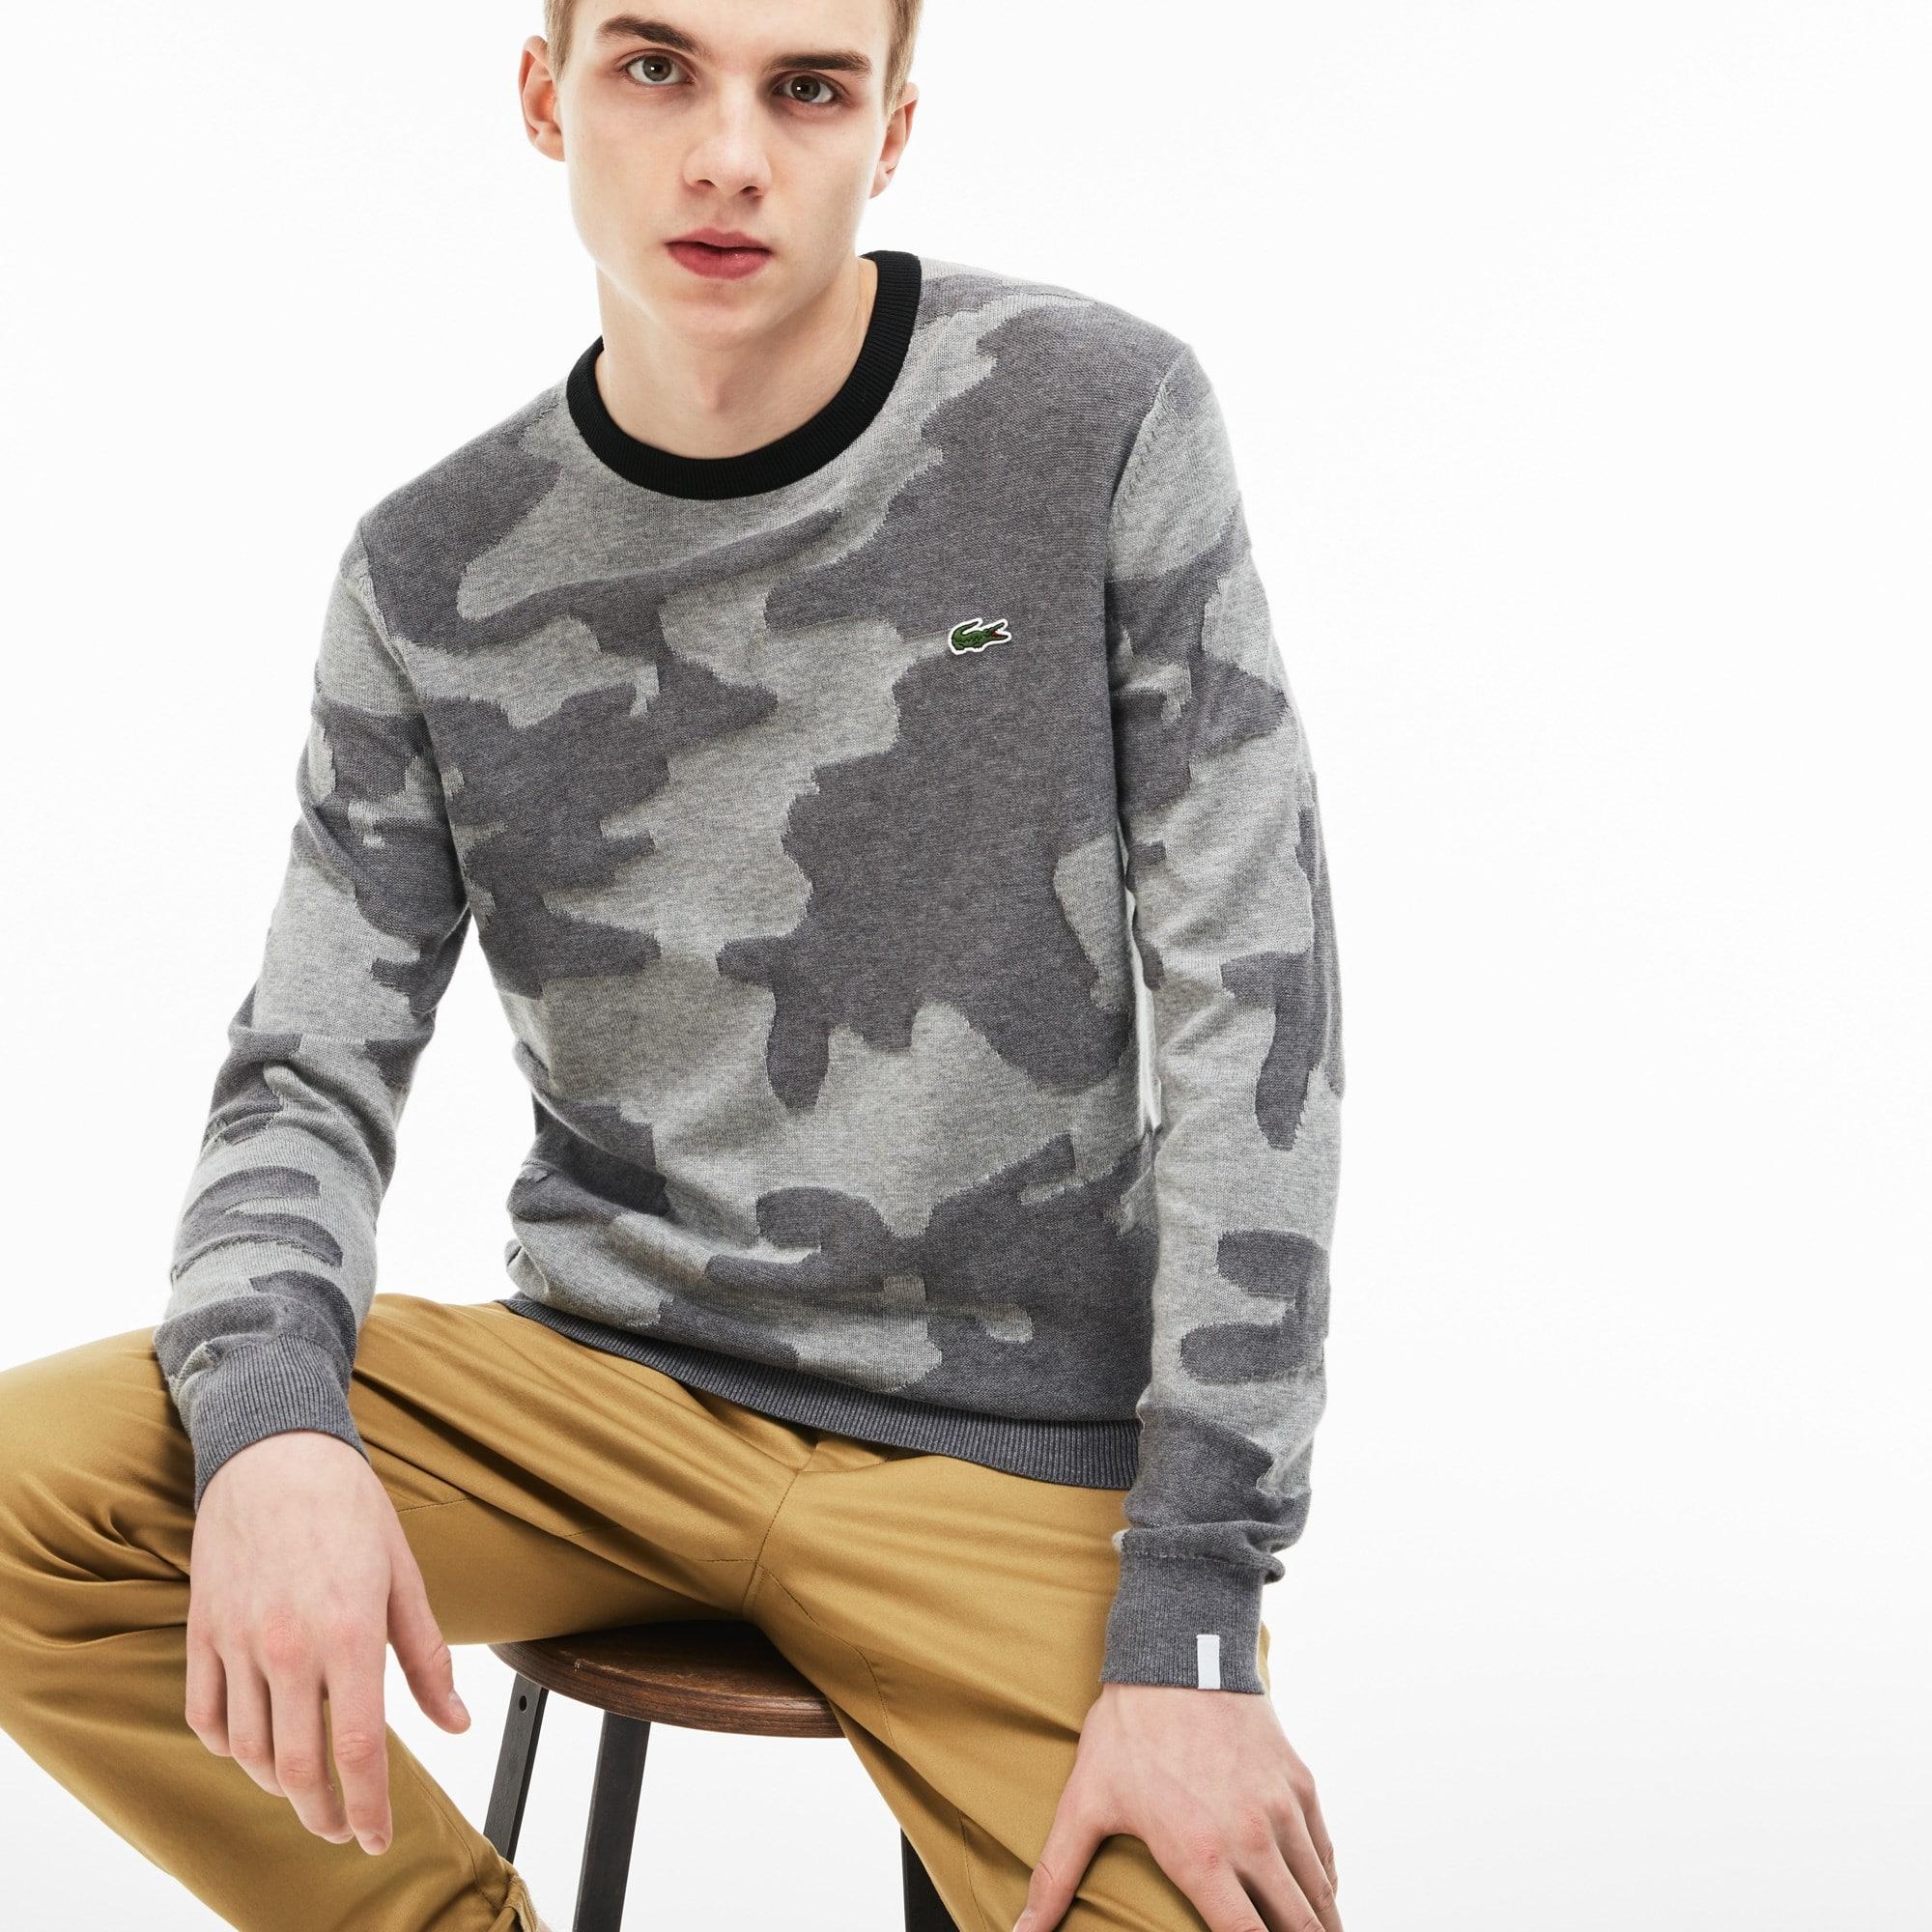 Men's Lacoste LIVE Crew Neck Camouflage Print Jacquard Sweater